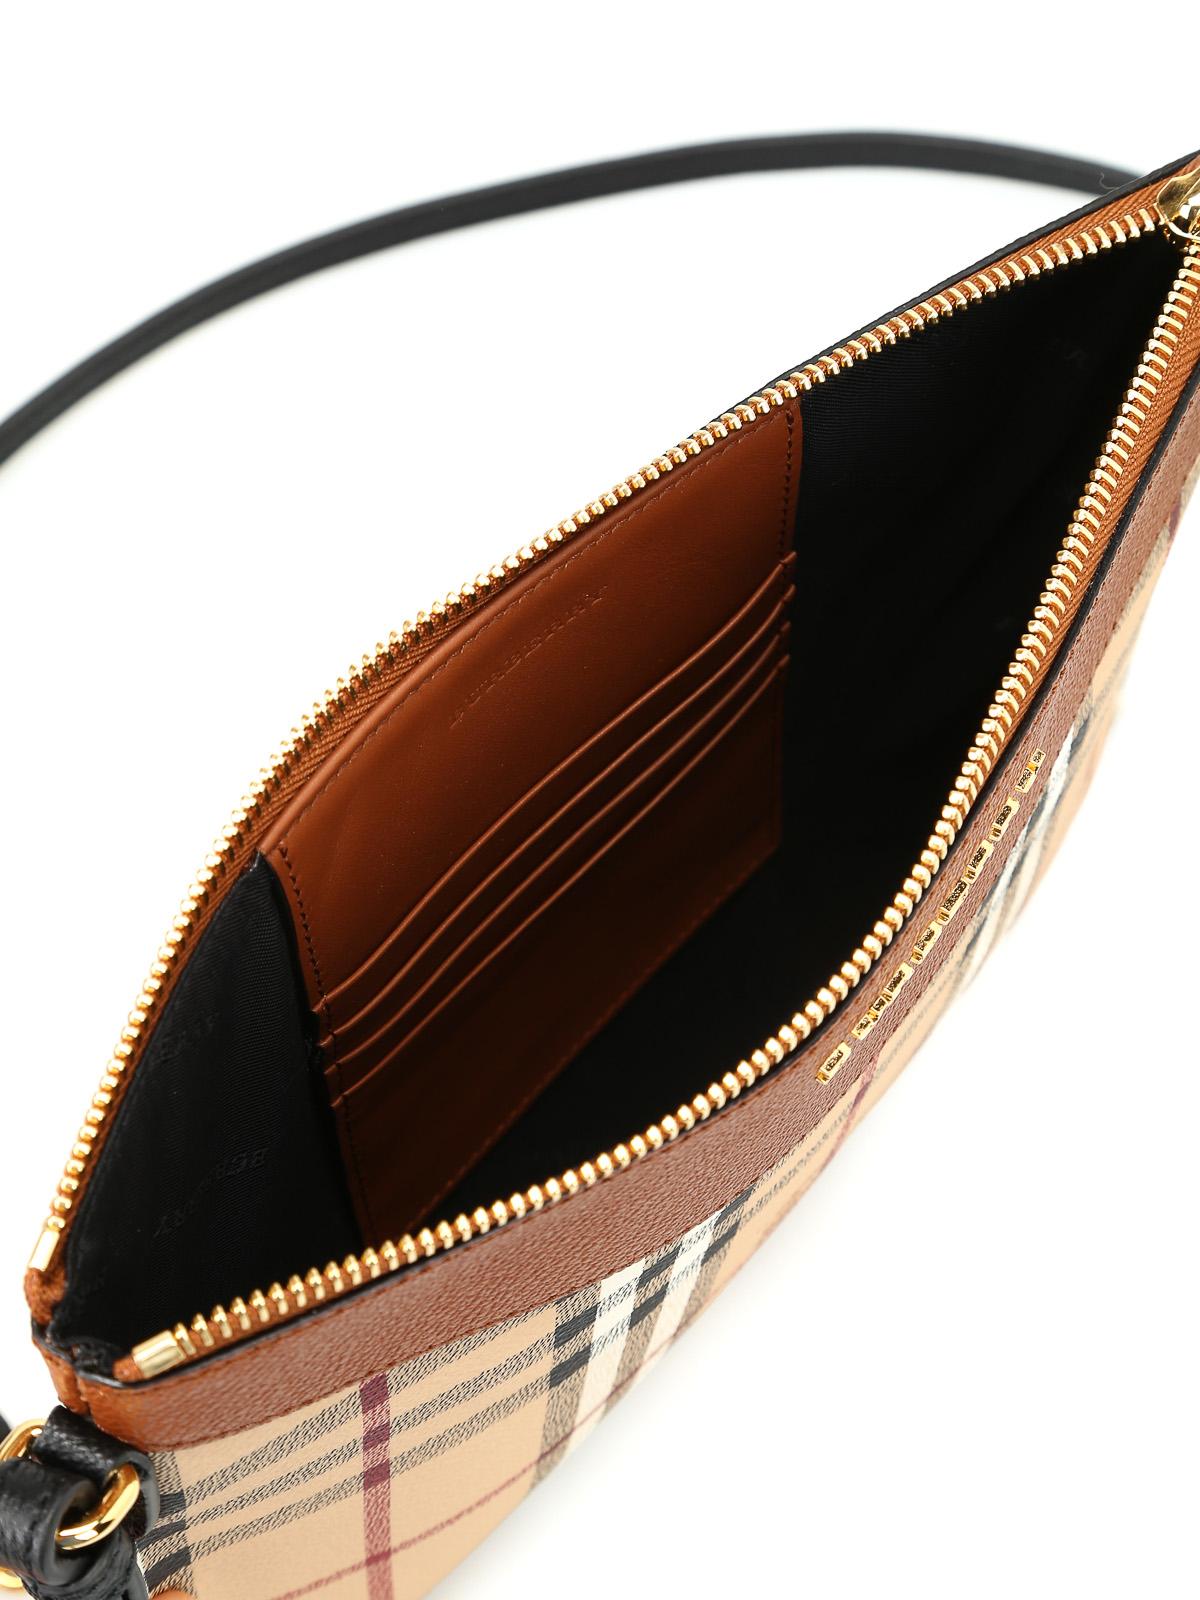 f31e48f80f BURBERRY buy online Tartan Haymarket check print pouch. BURBERRY: cross  body bags ...